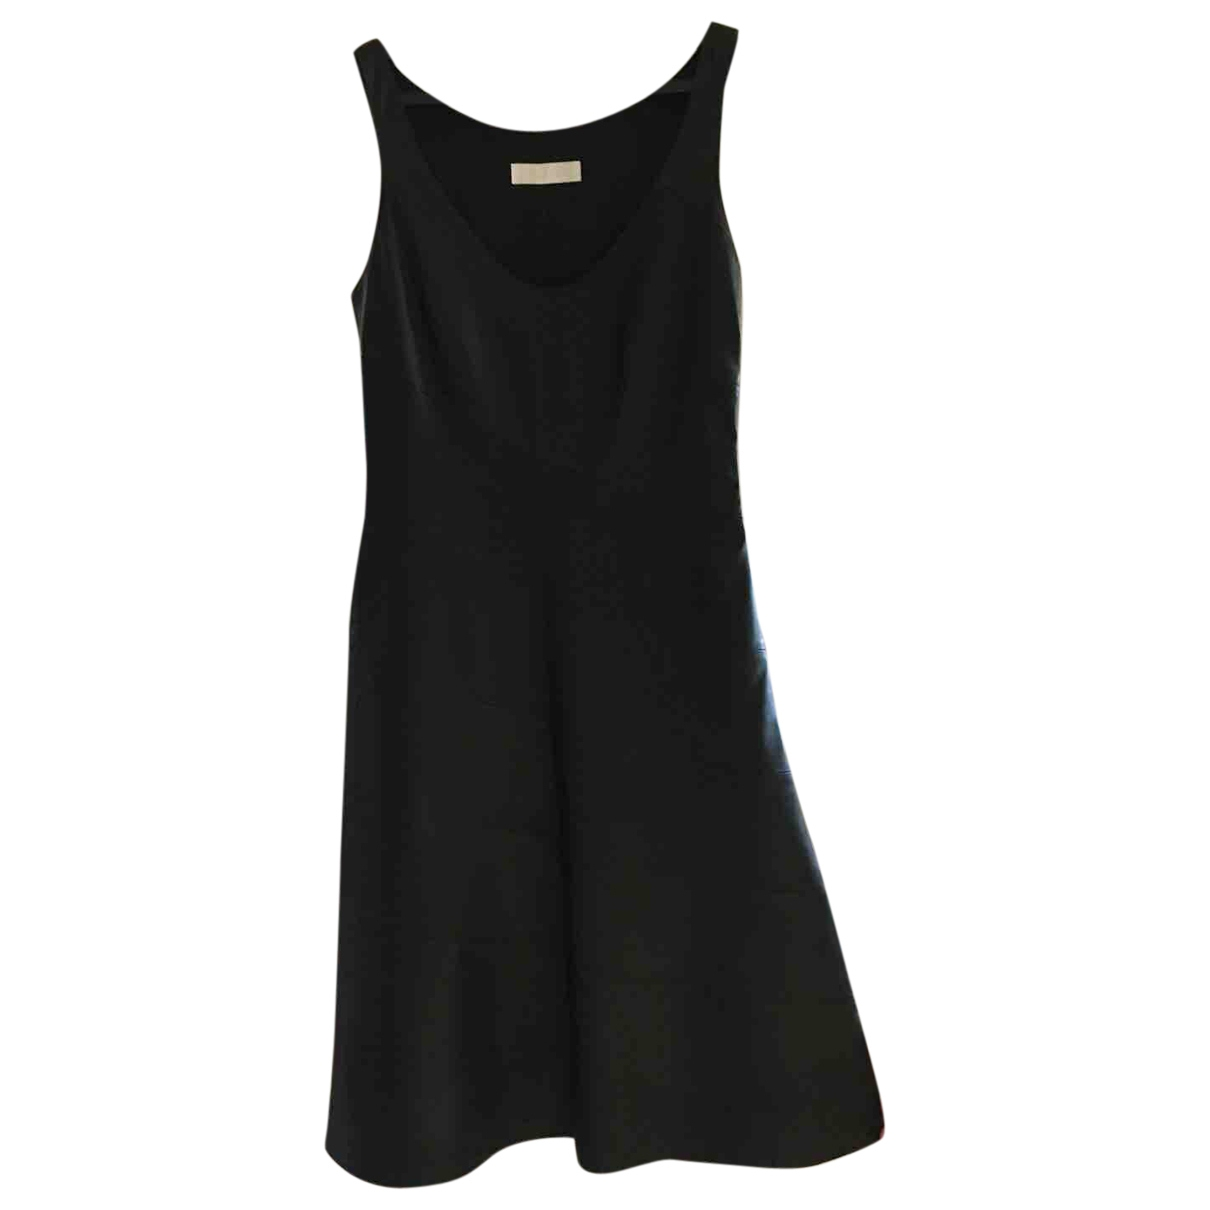 Nicole Farhi \N Black Leather dress for Women 8 UK